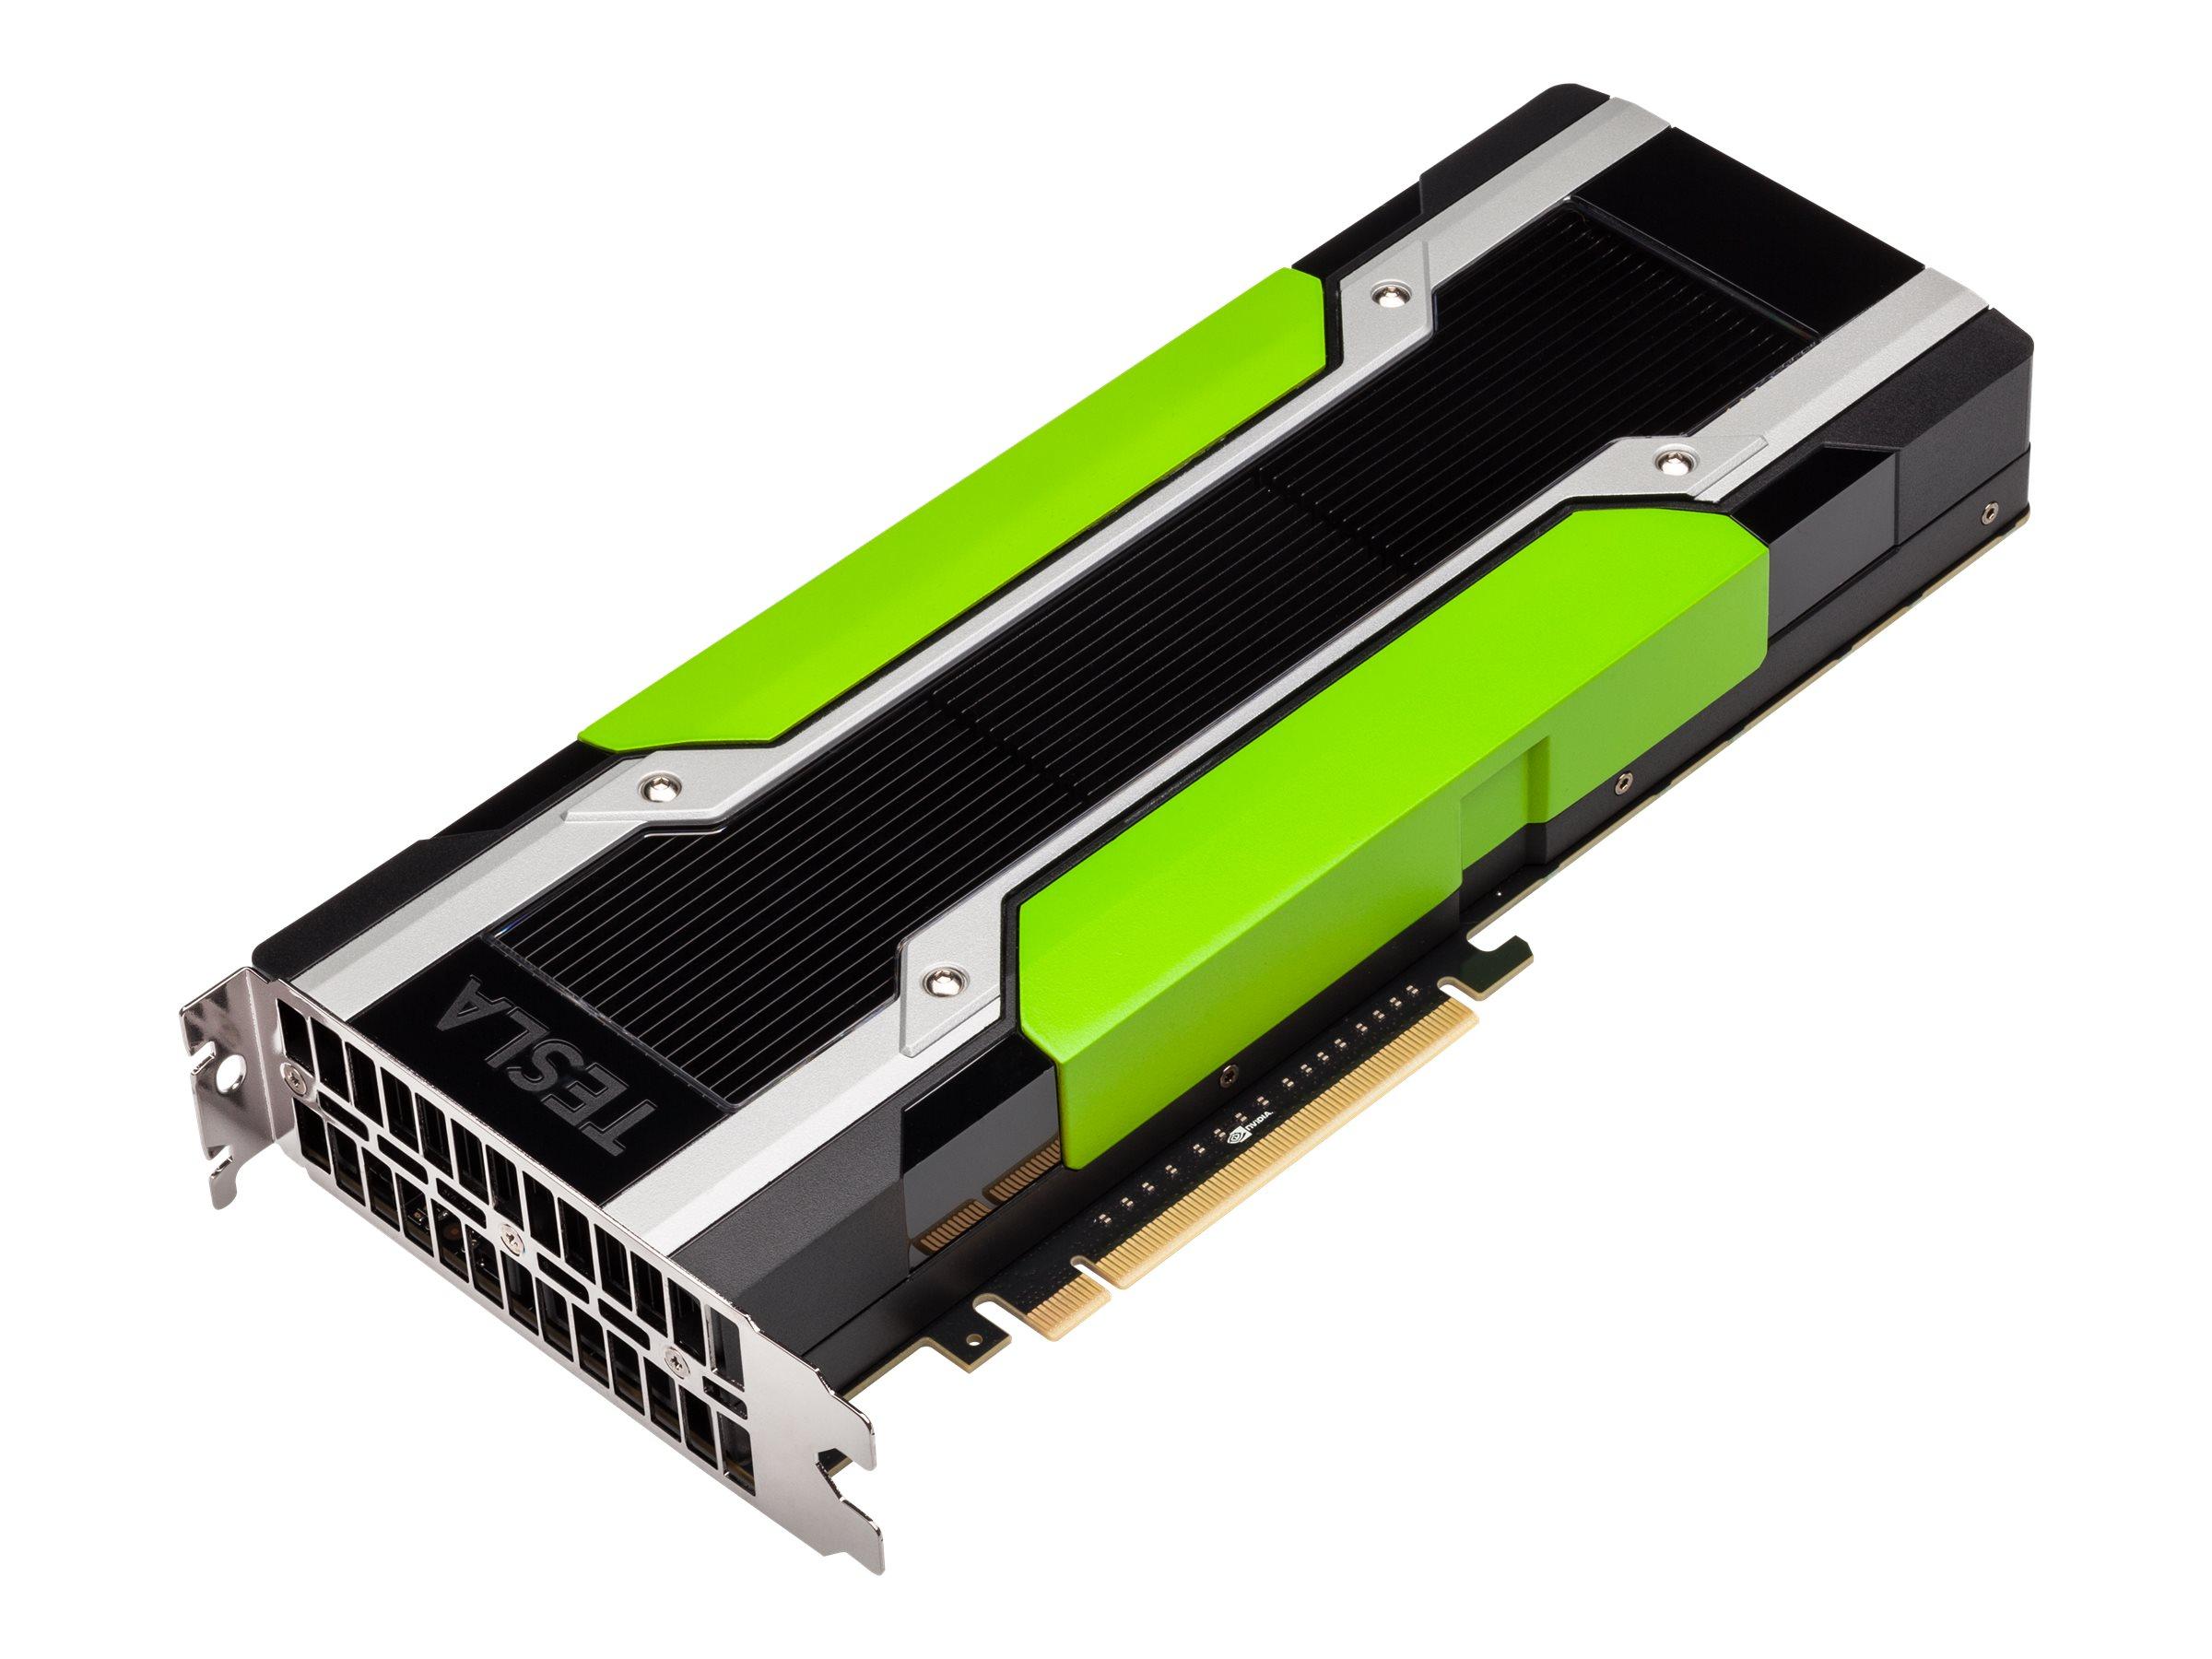 PNY NVIDIA Tesla K80 - GPU-Rechenprozessor